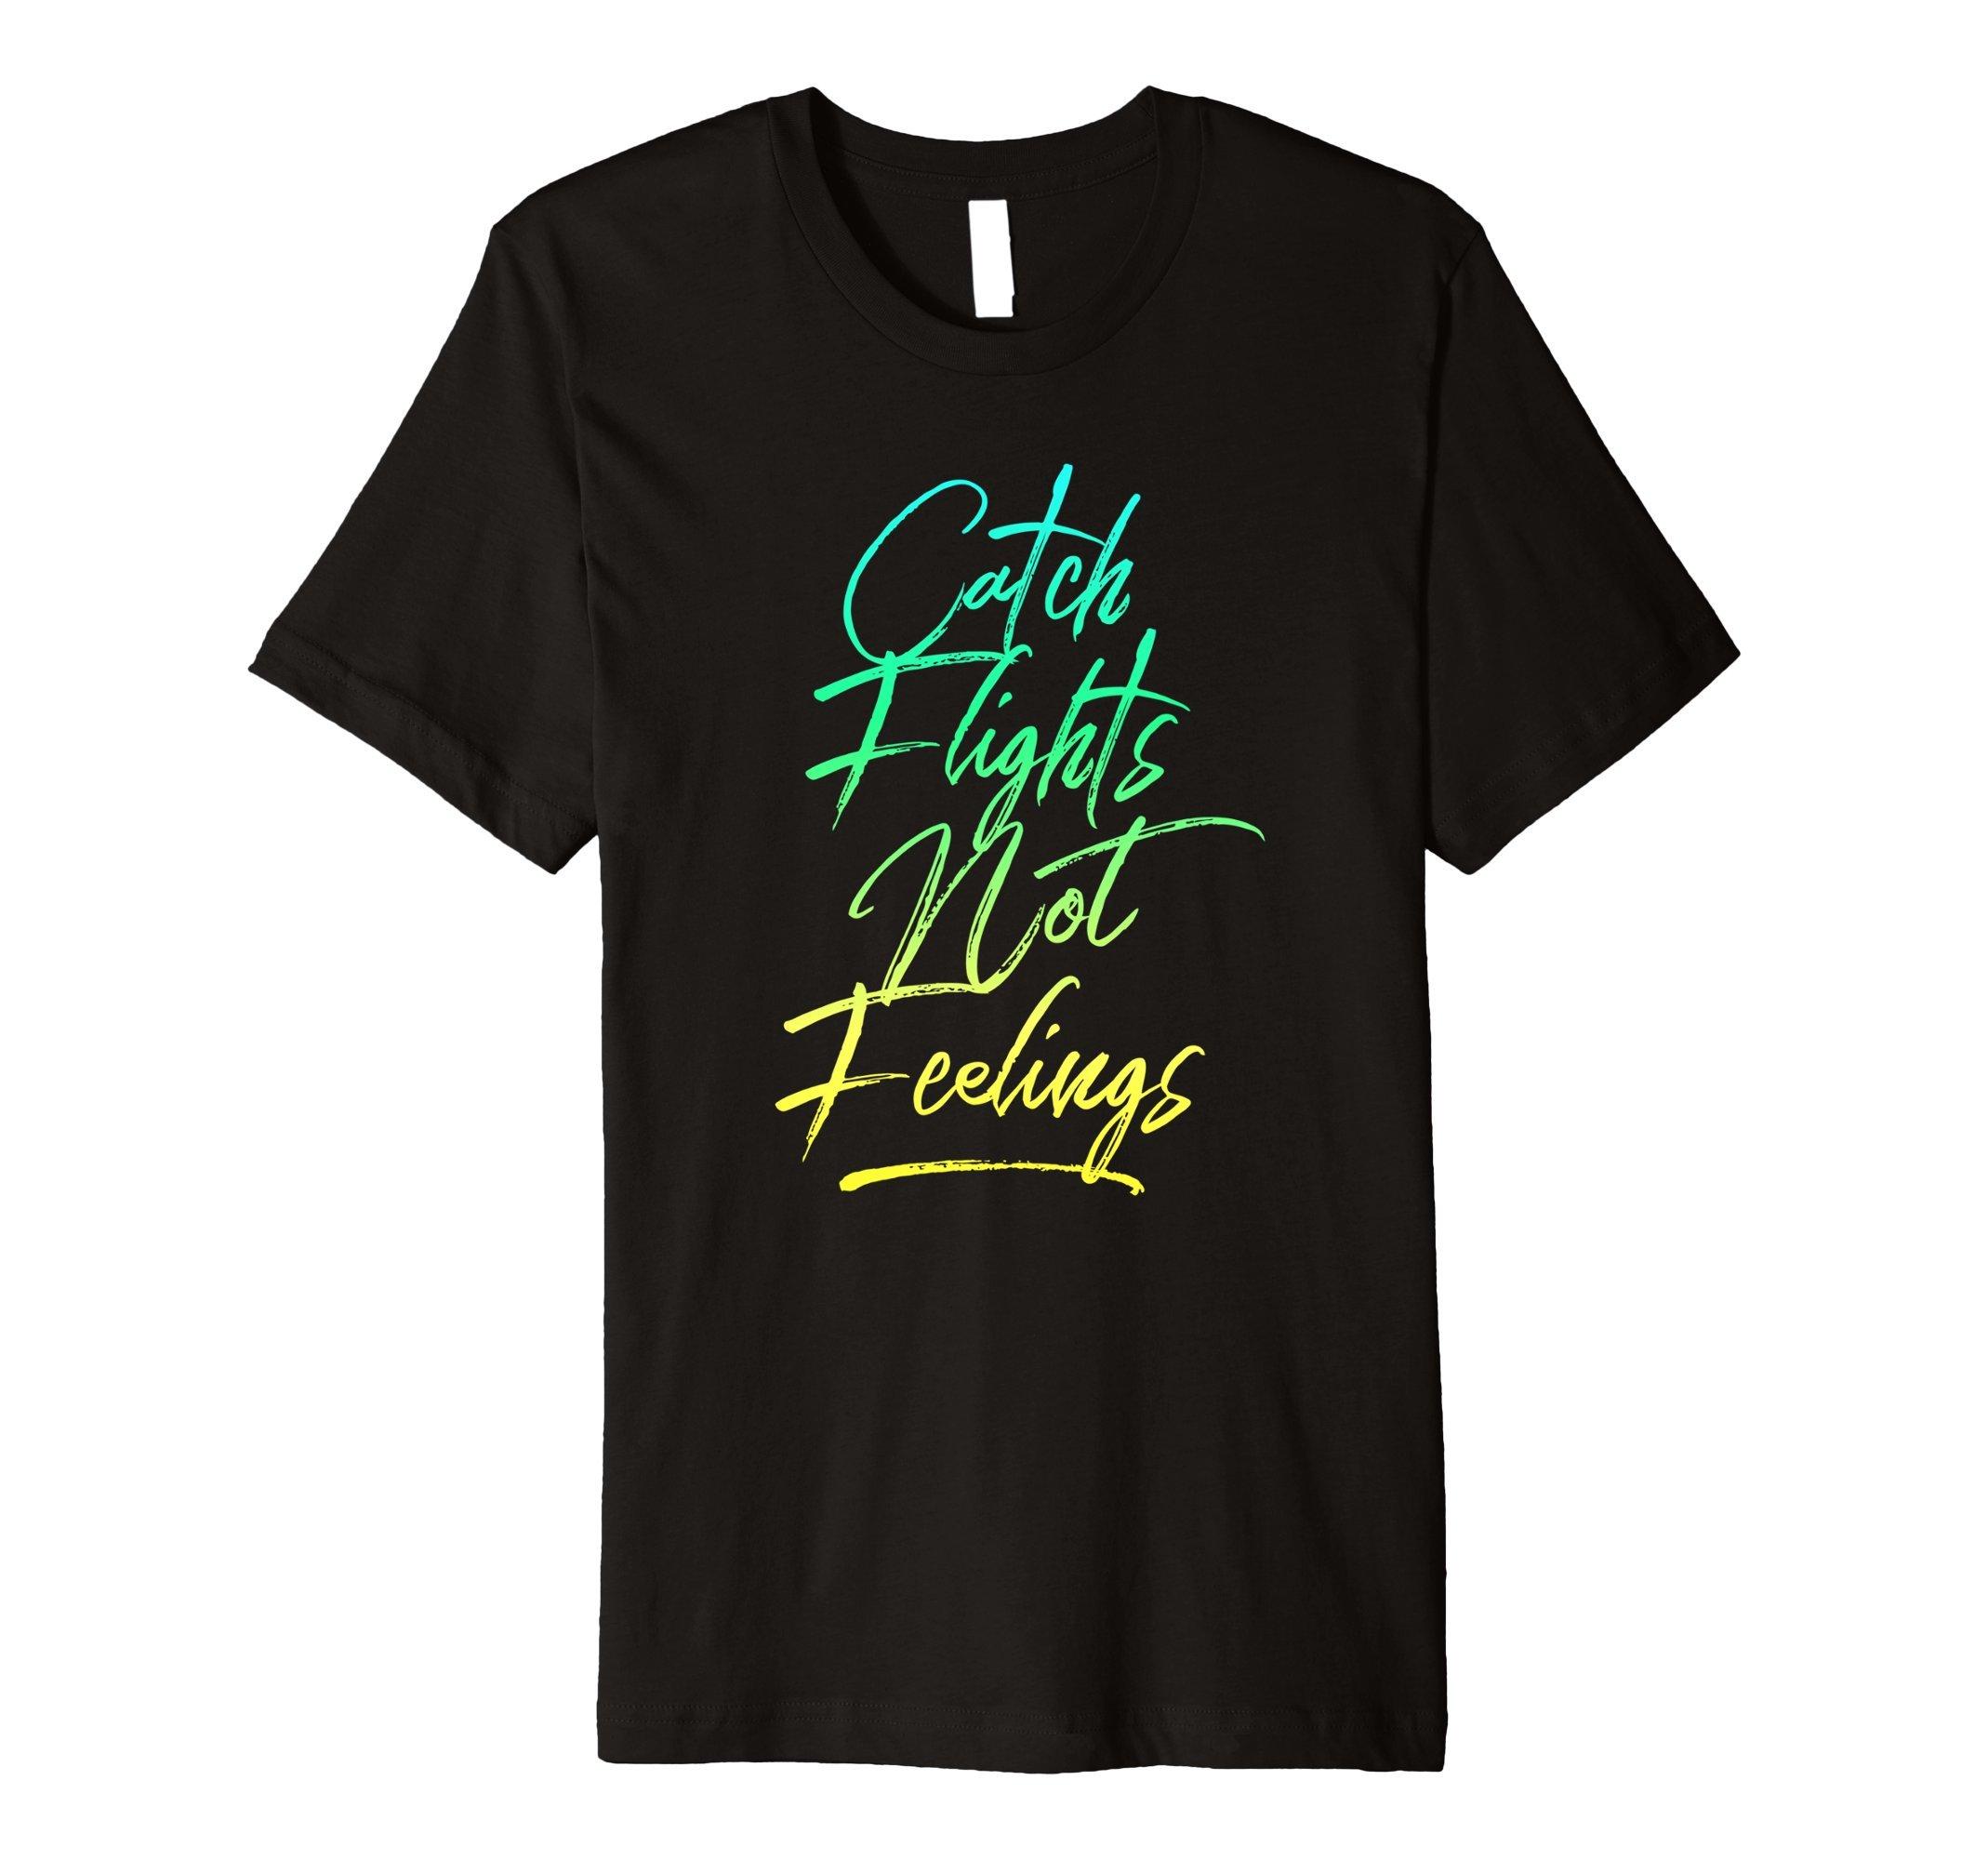 Catch Flights Not Feelings T-Shirt - I Love To Travel Shirt